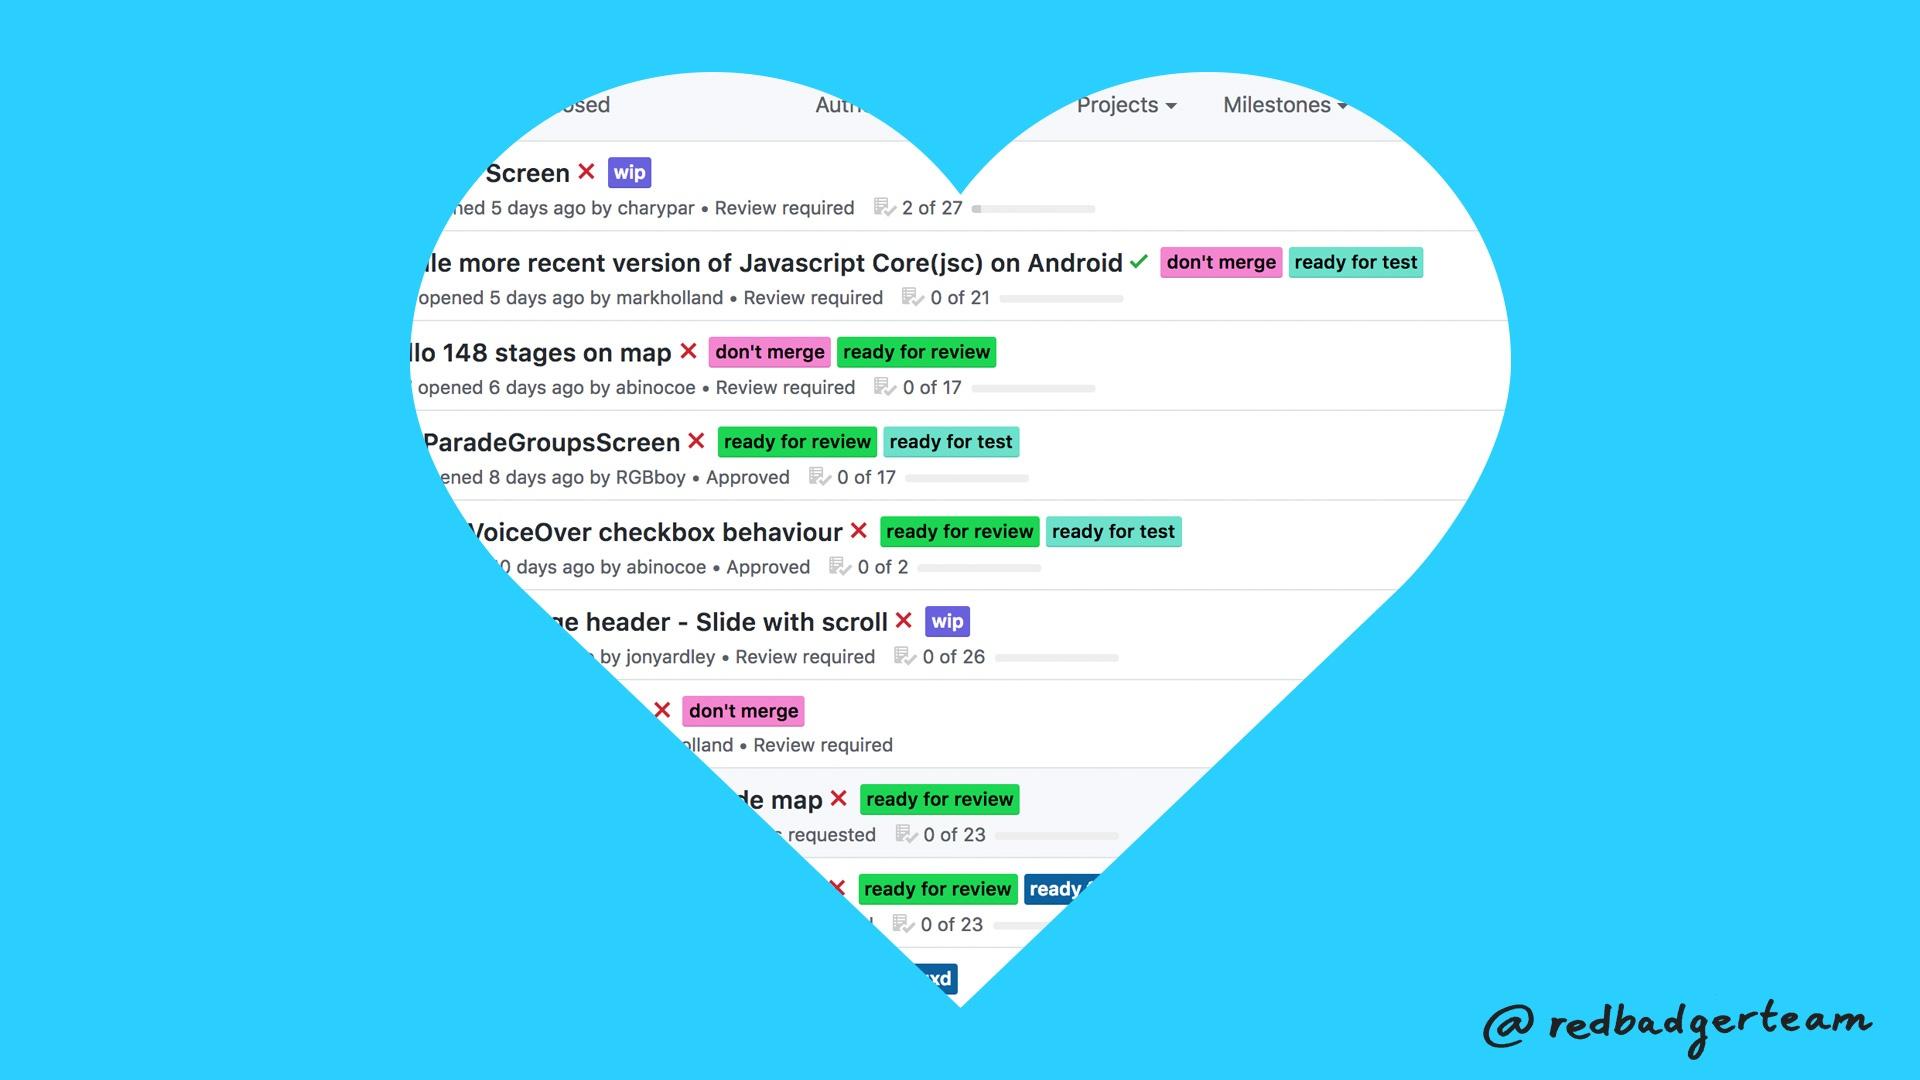 Pride_heart_OpenSource